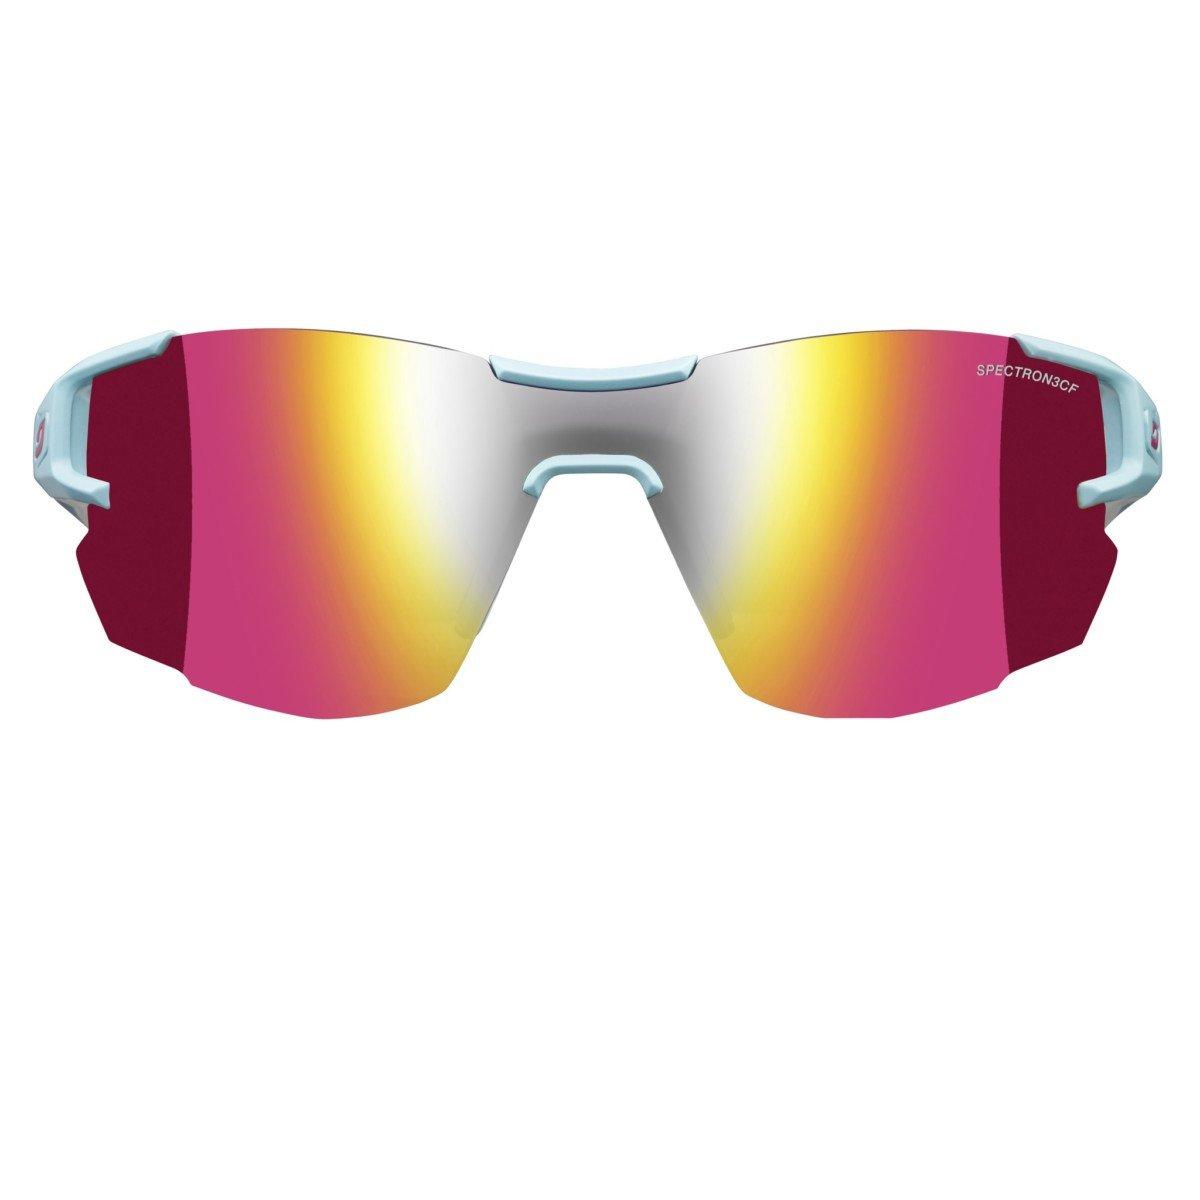 b0522292e0 Julbo Aerolite SP3CF, lunette de soleil running pour femme. -